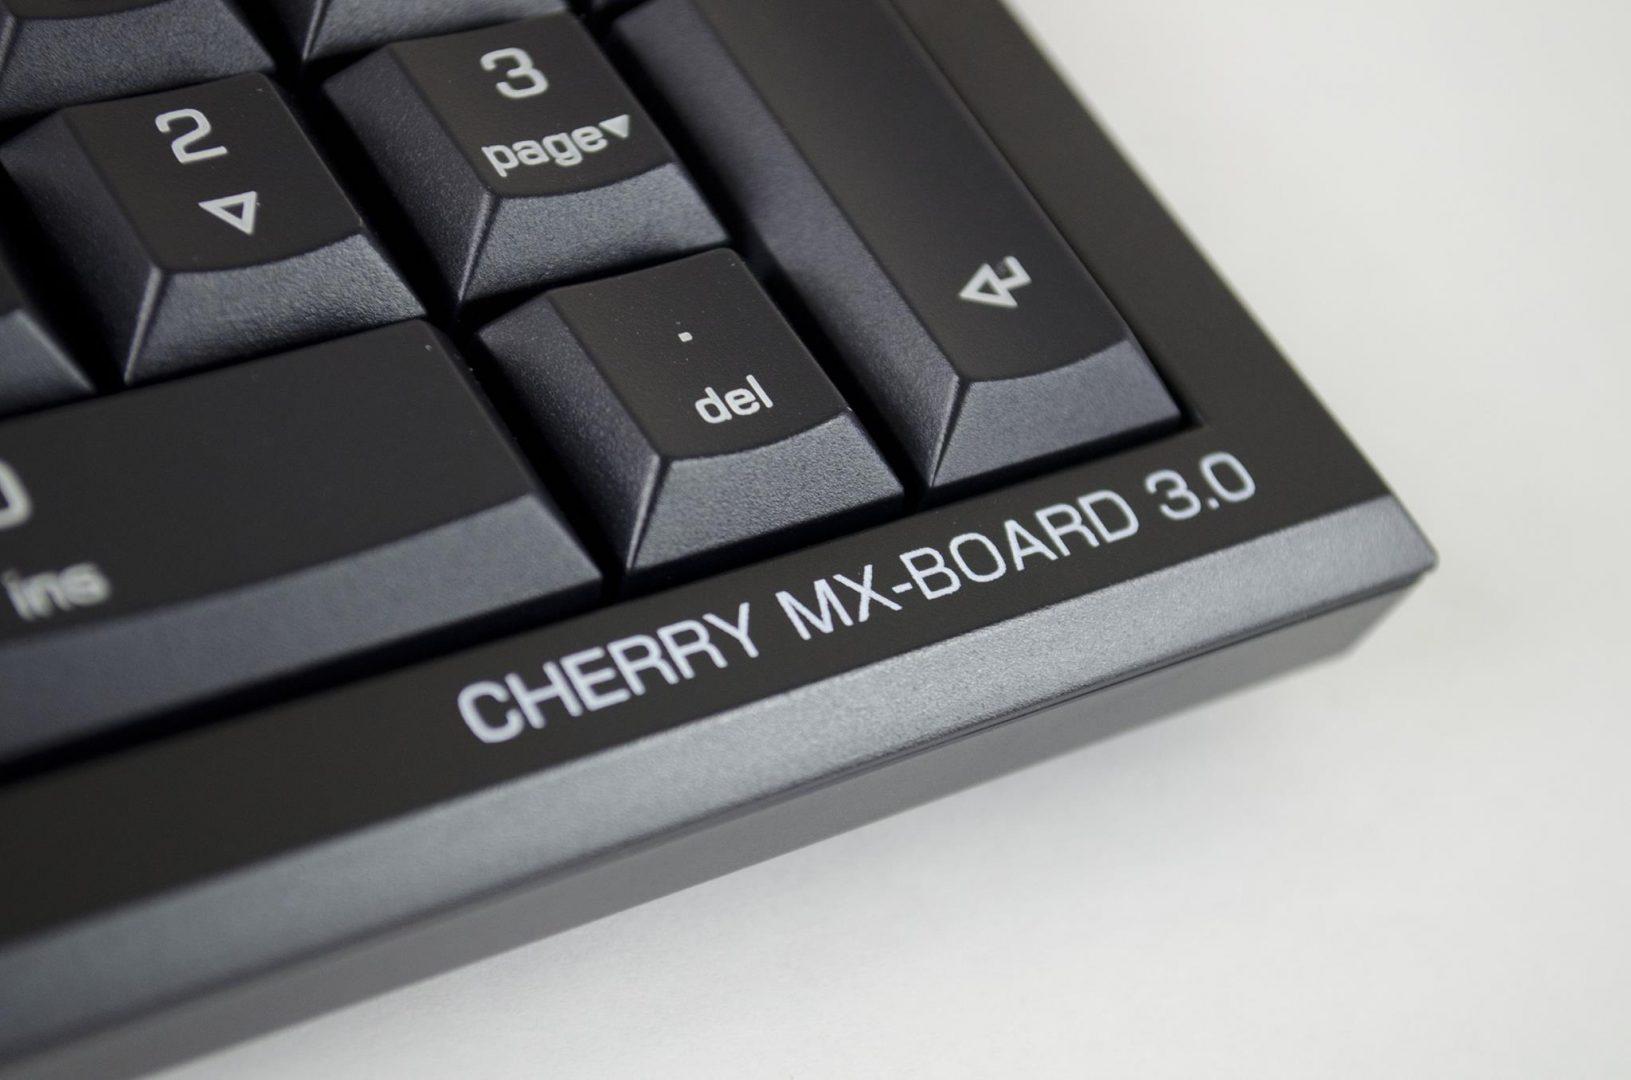 Cherry MX-Board 3.0 Mechanical Keyboard Review